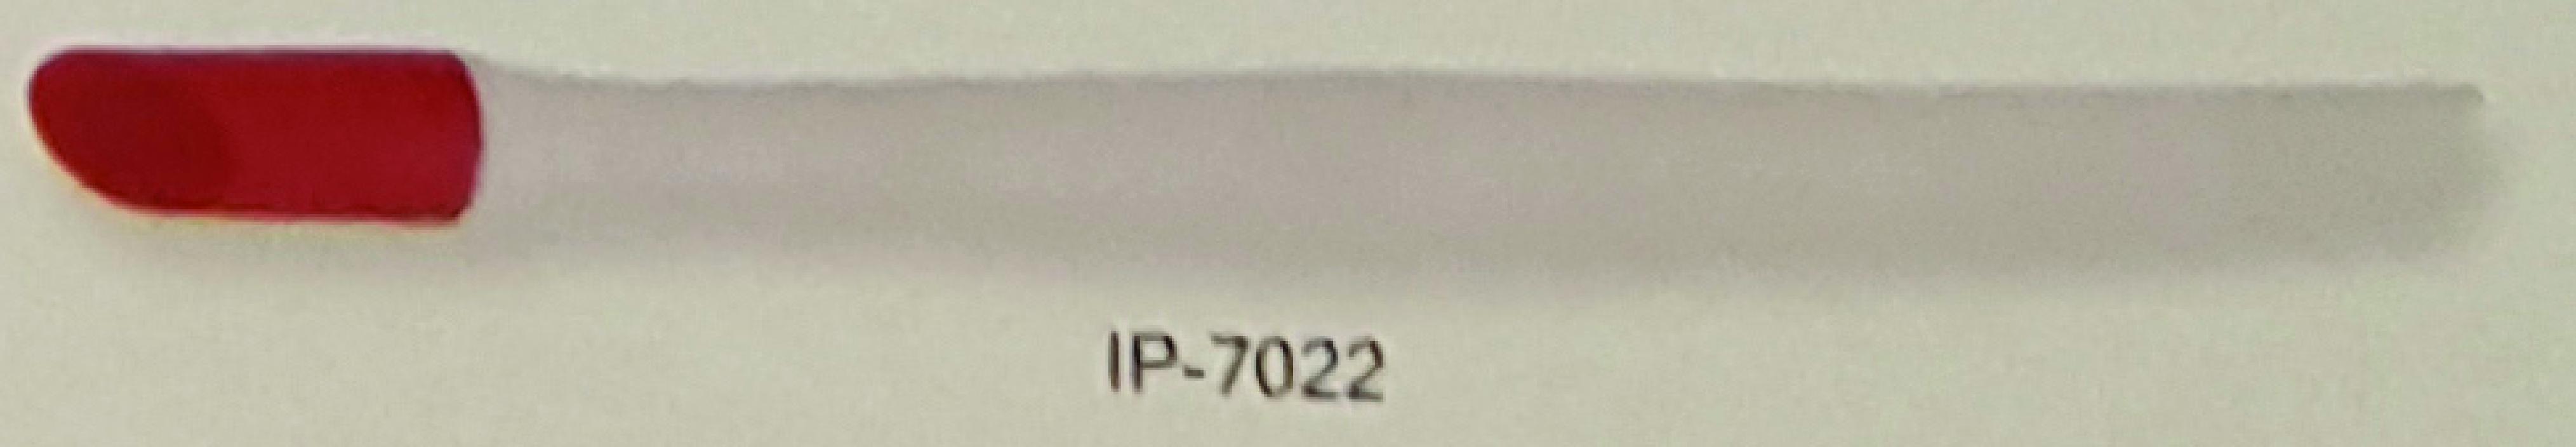 IP-7022